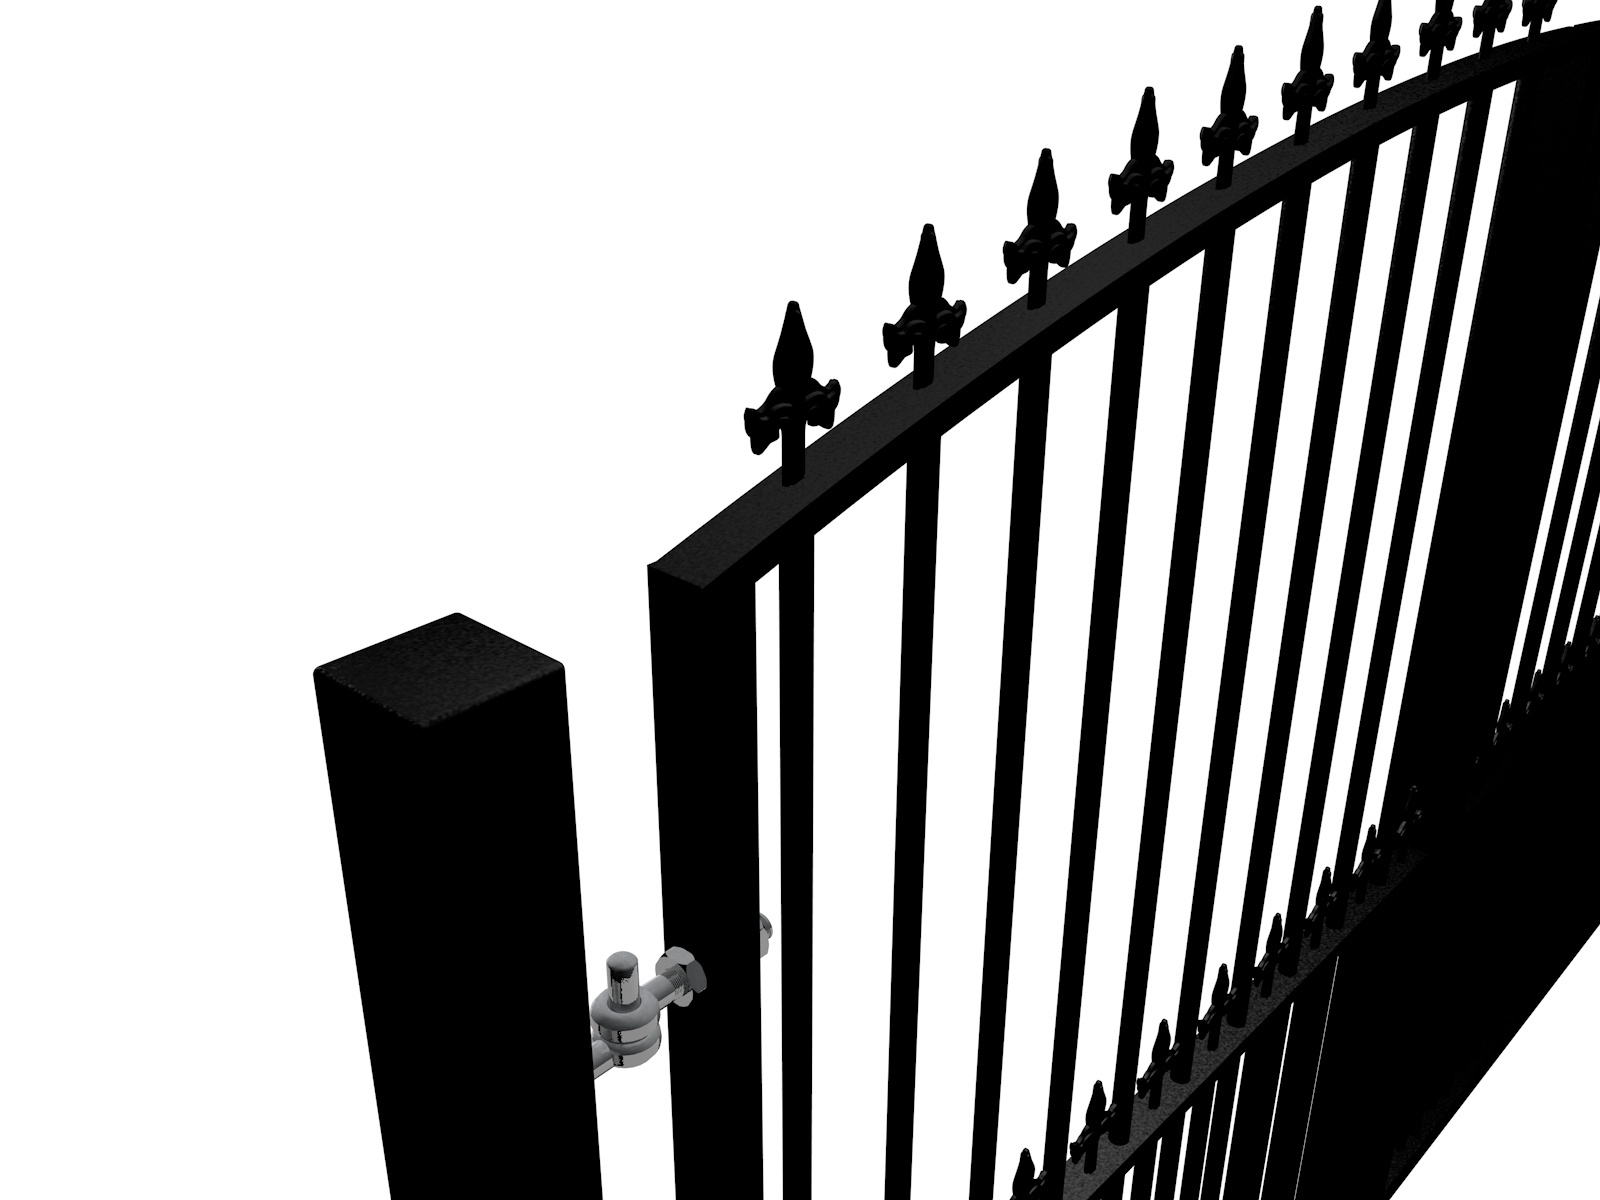 Arch Top Swinging Metal Gate W/Dog Bars & Finials Somerset